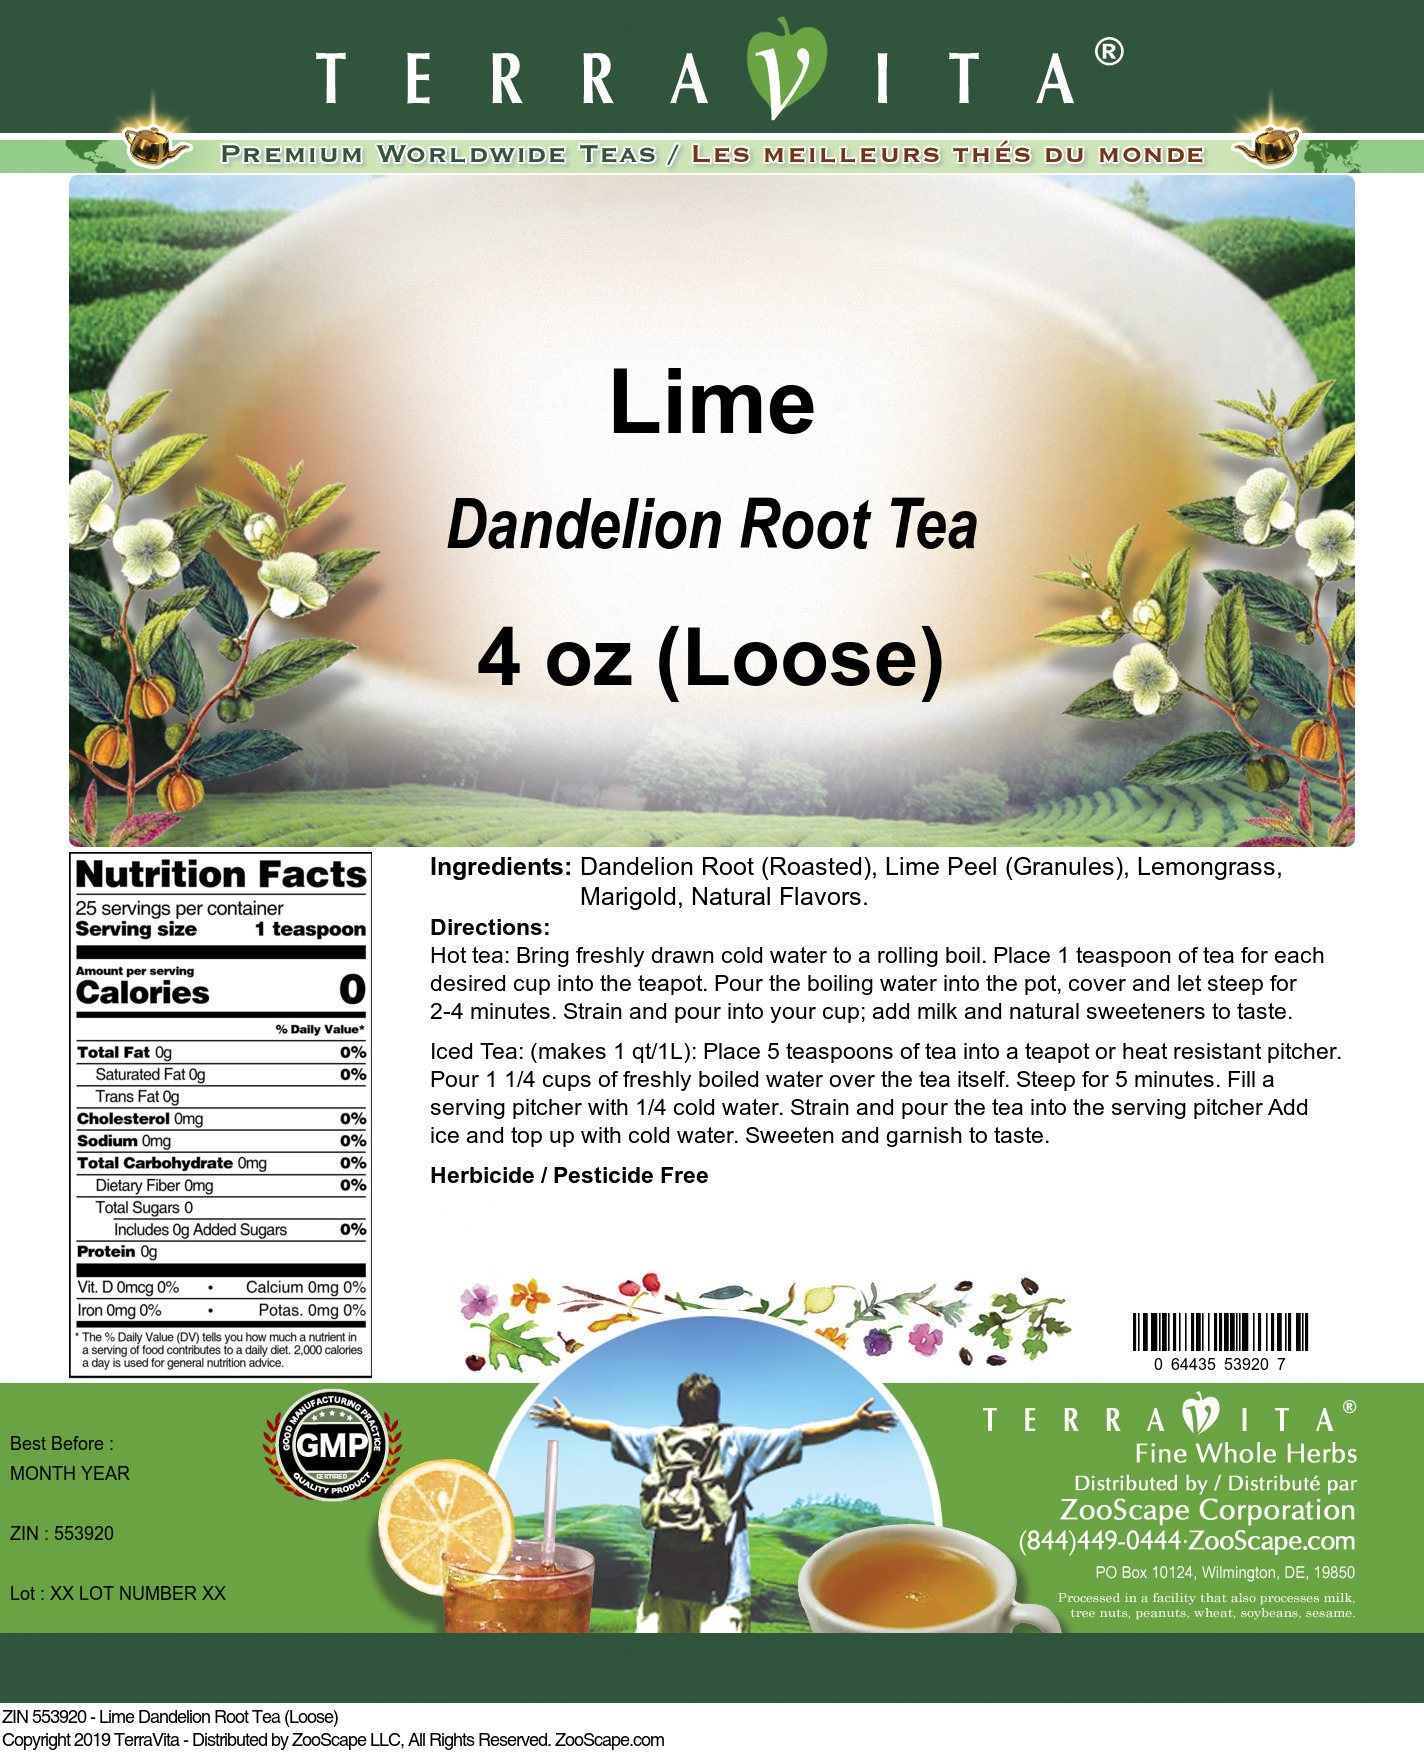 Lime Dandelion Root Tea (Loose)